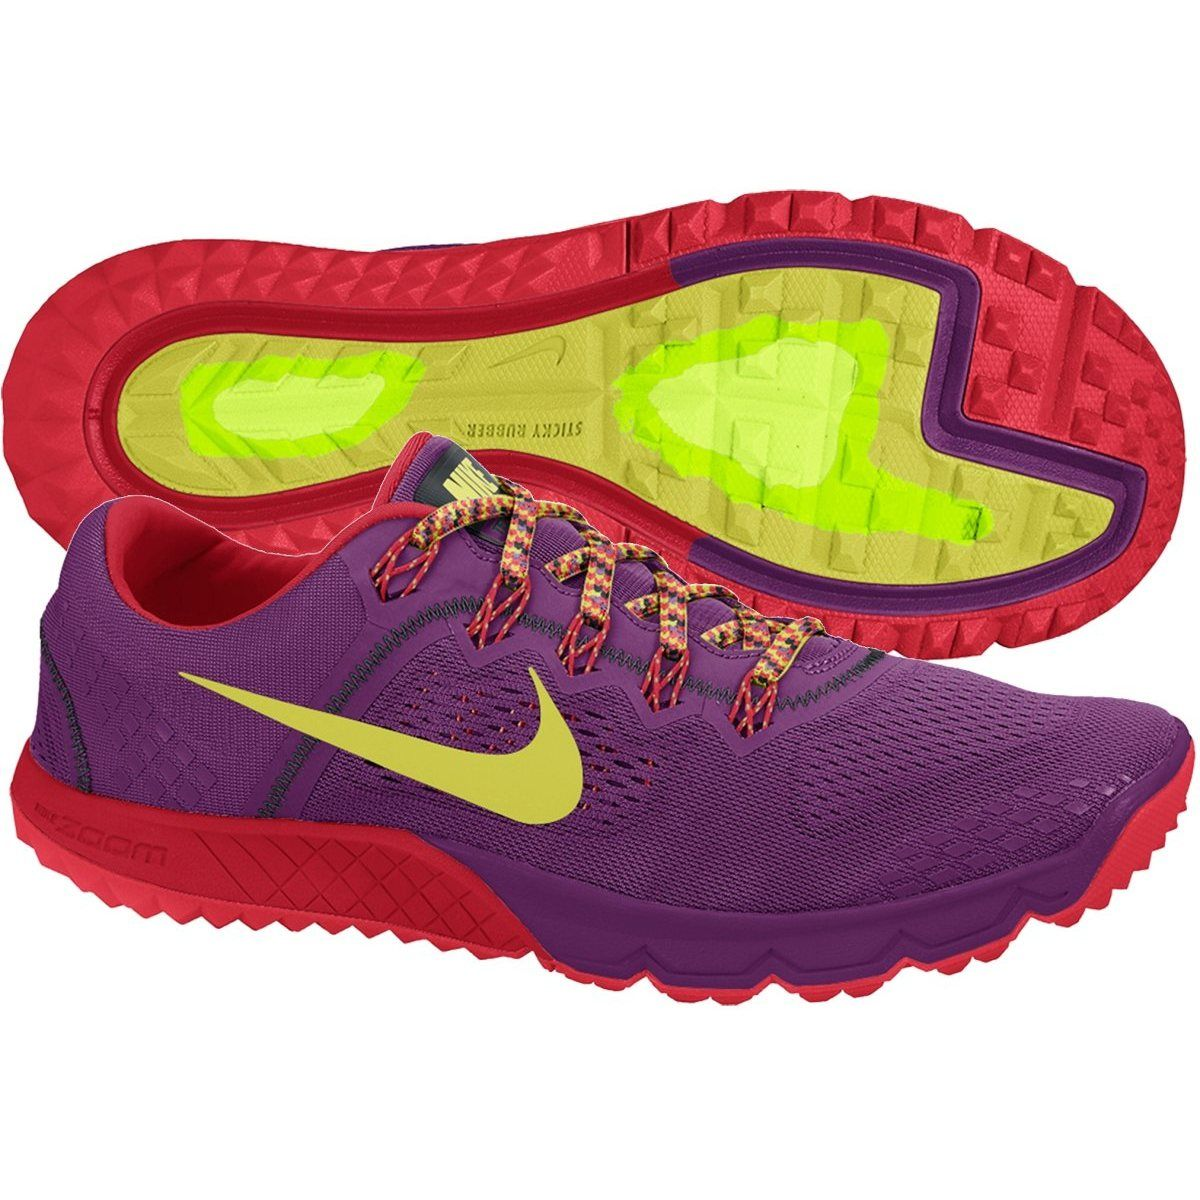 6c808e0d68 Dámská obuv NIKE WMNS ZOOM TERRA KIGER - Glami.cz Nike Free, Sporty